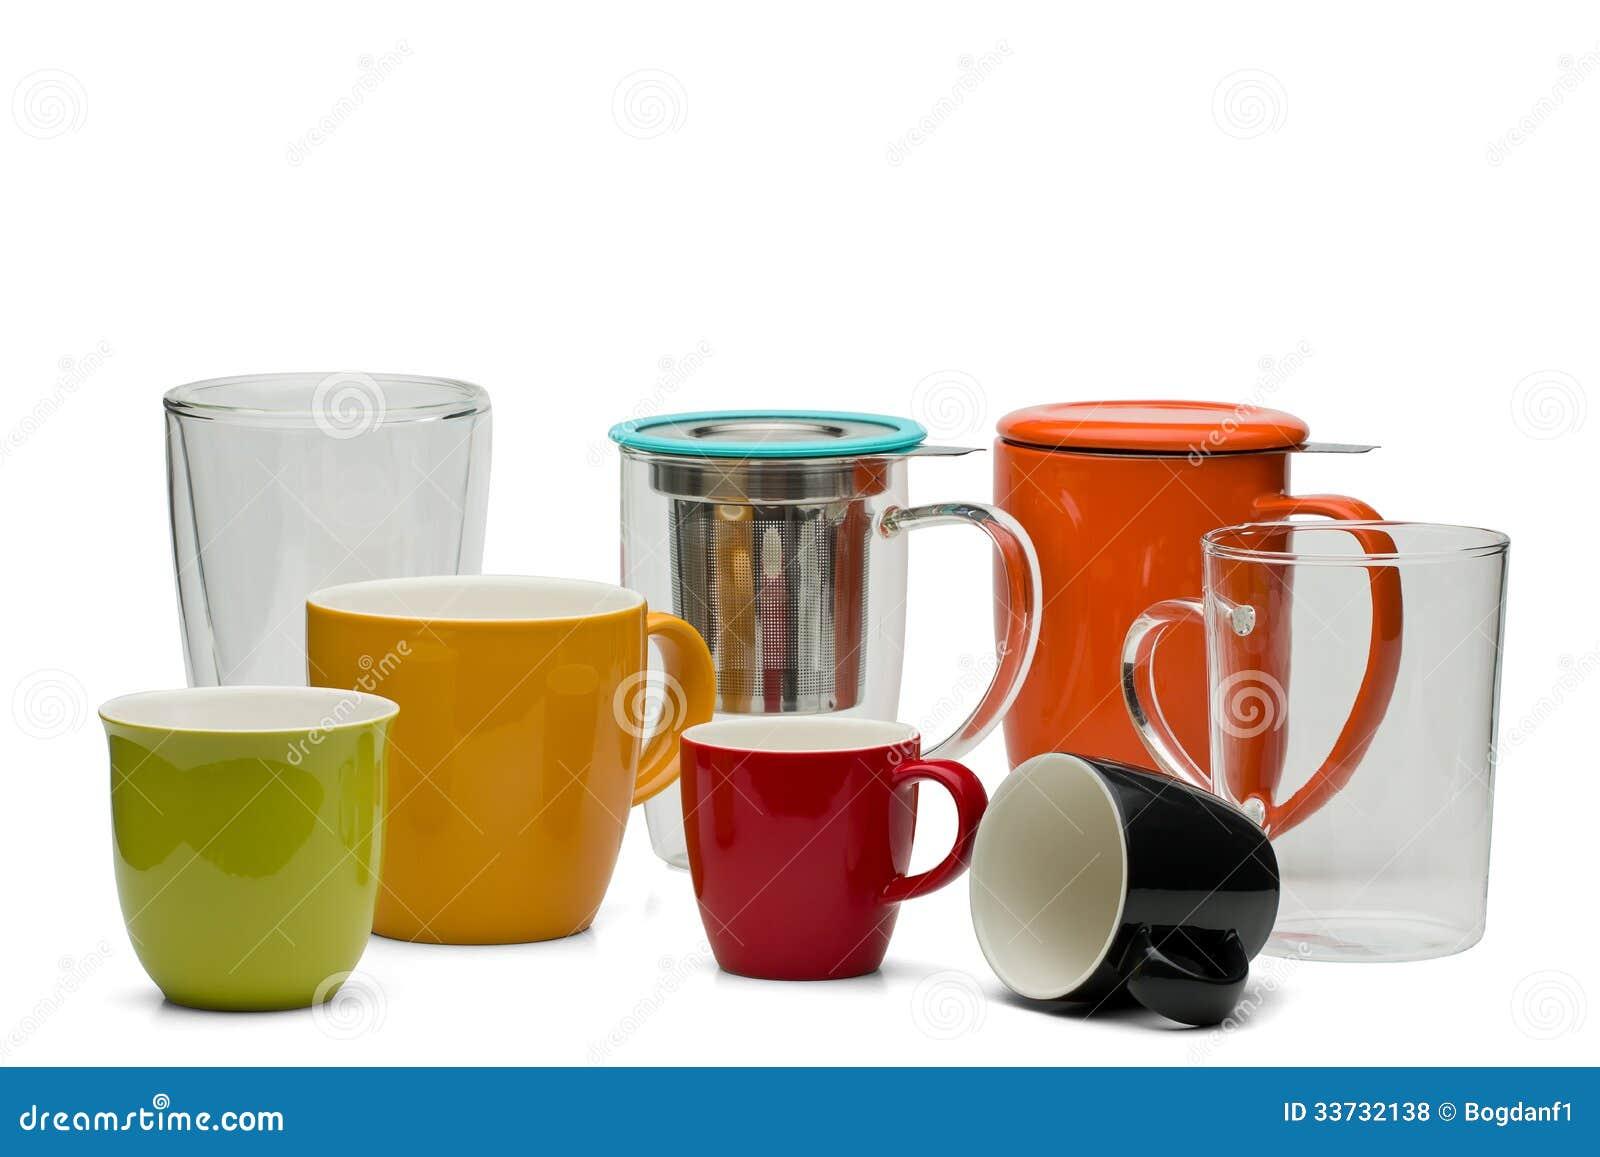 Categoriefoto met thee dienende mokken, koppen en glazen